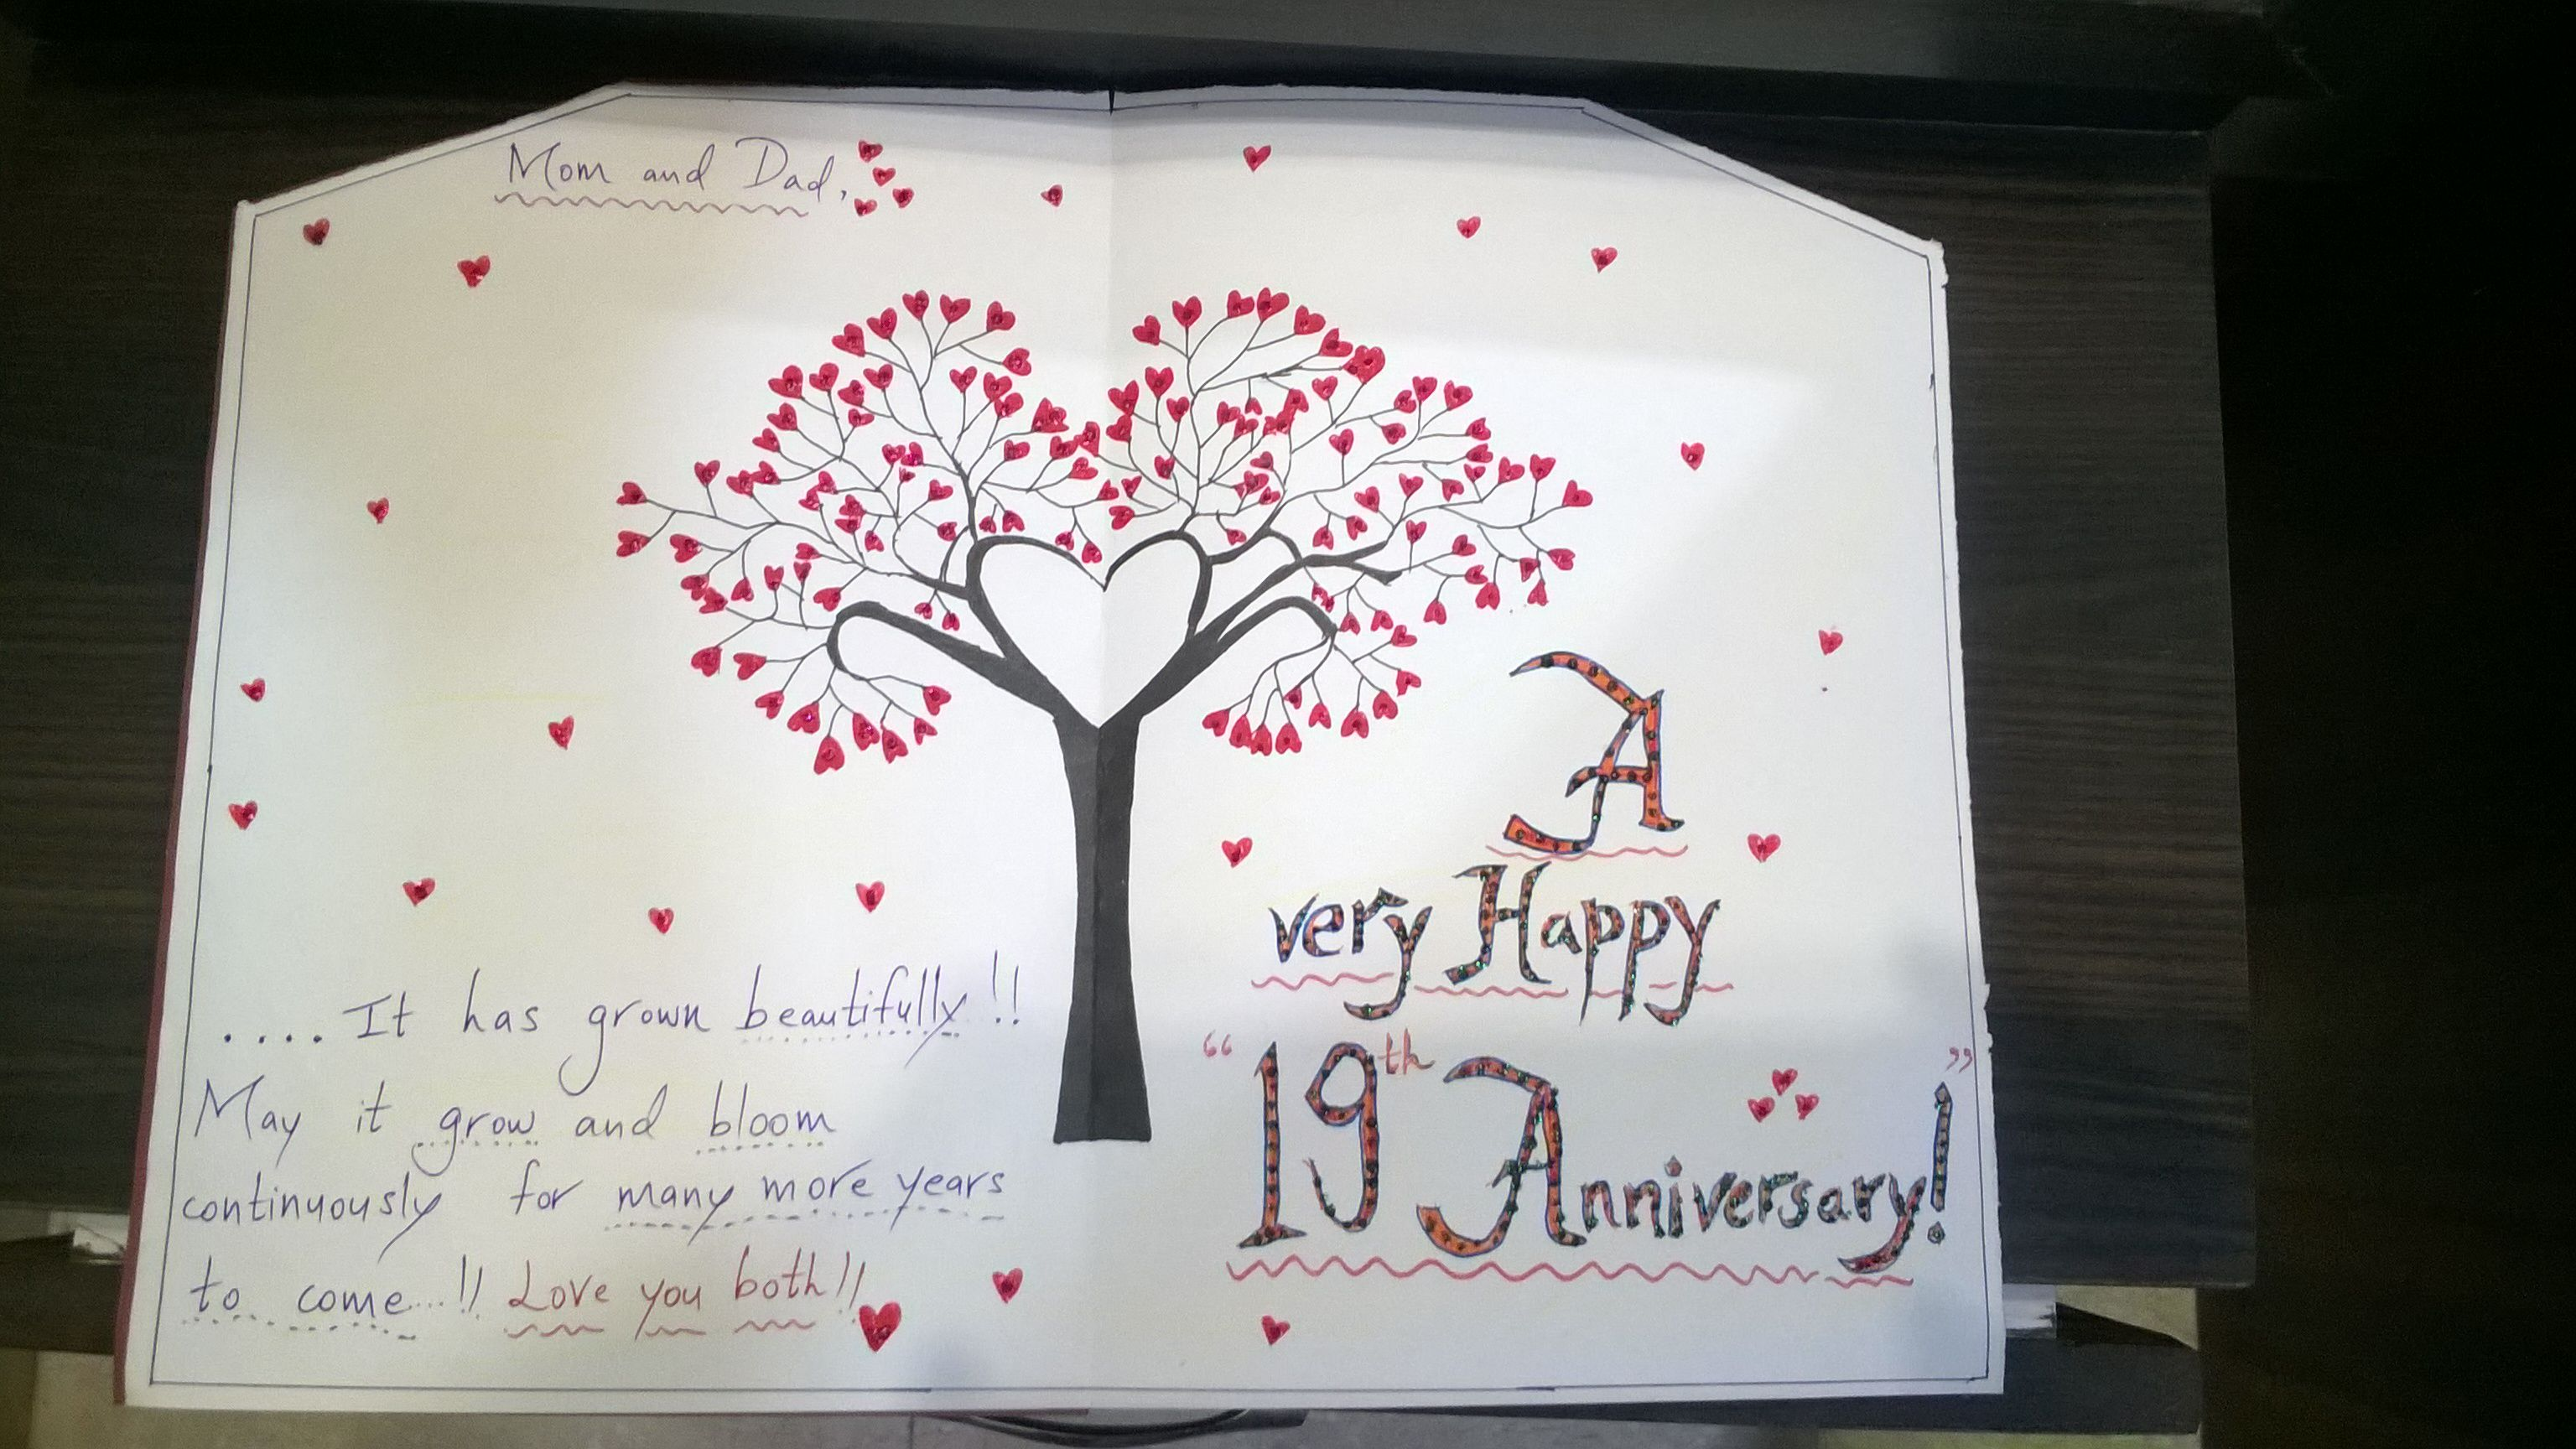 Happy 19th Wedding Anniversary Mom Dad! 😊